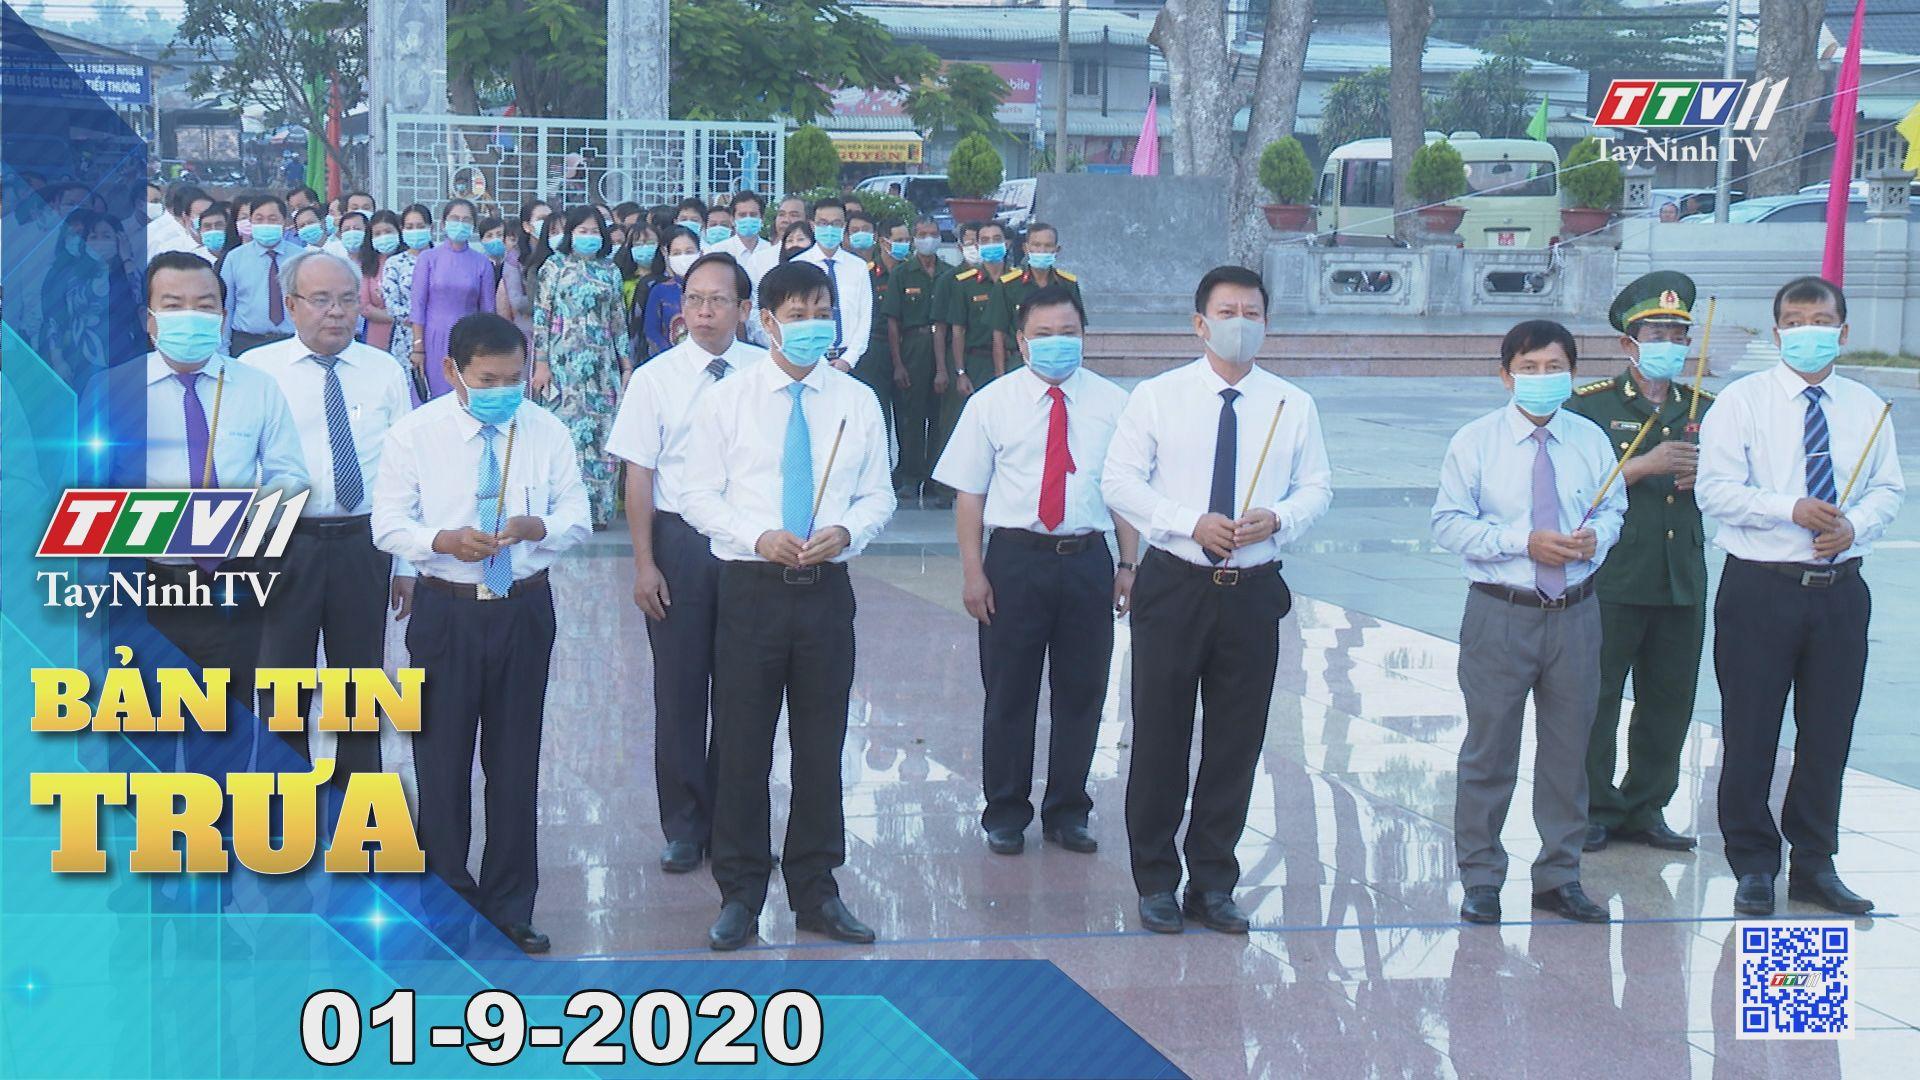 Bản tin trưa 01-9-2020 | Tin tức hôm nay | TayNinhTV